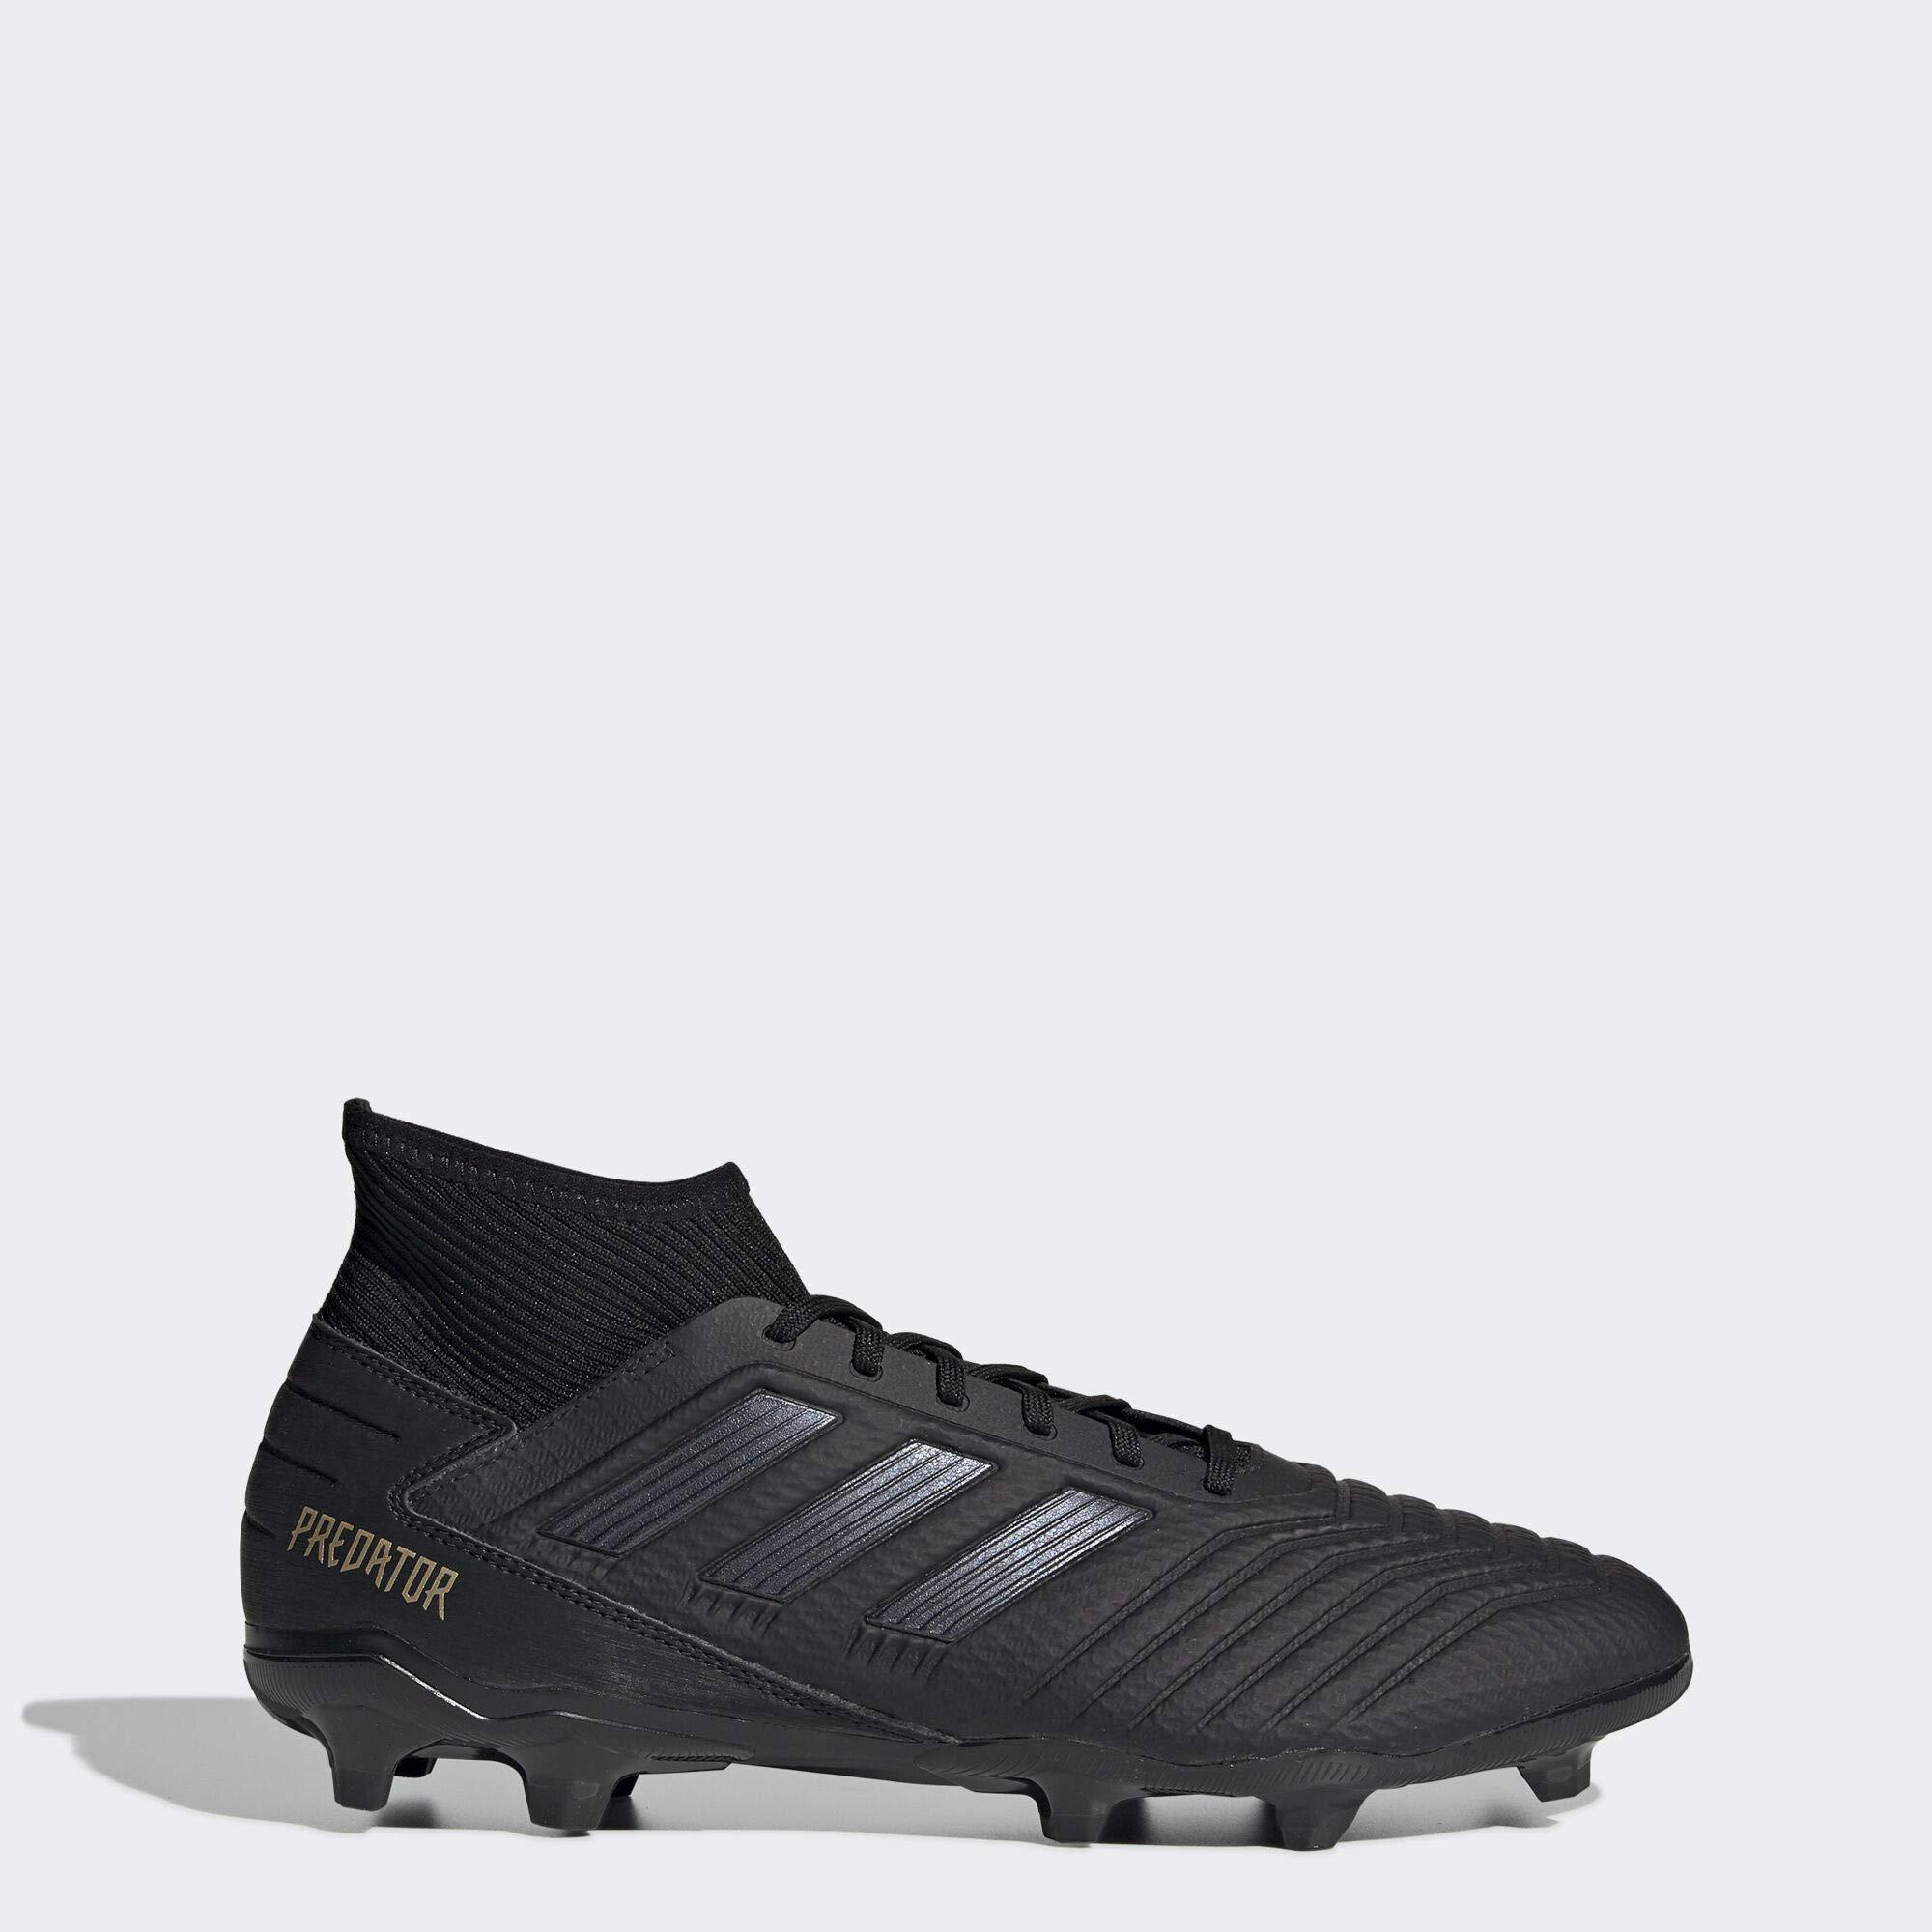 adidas Men's Predator 19.3 Firm Ground Soccer Shoe, Black/Gold Metallic, 9 M US by adidas